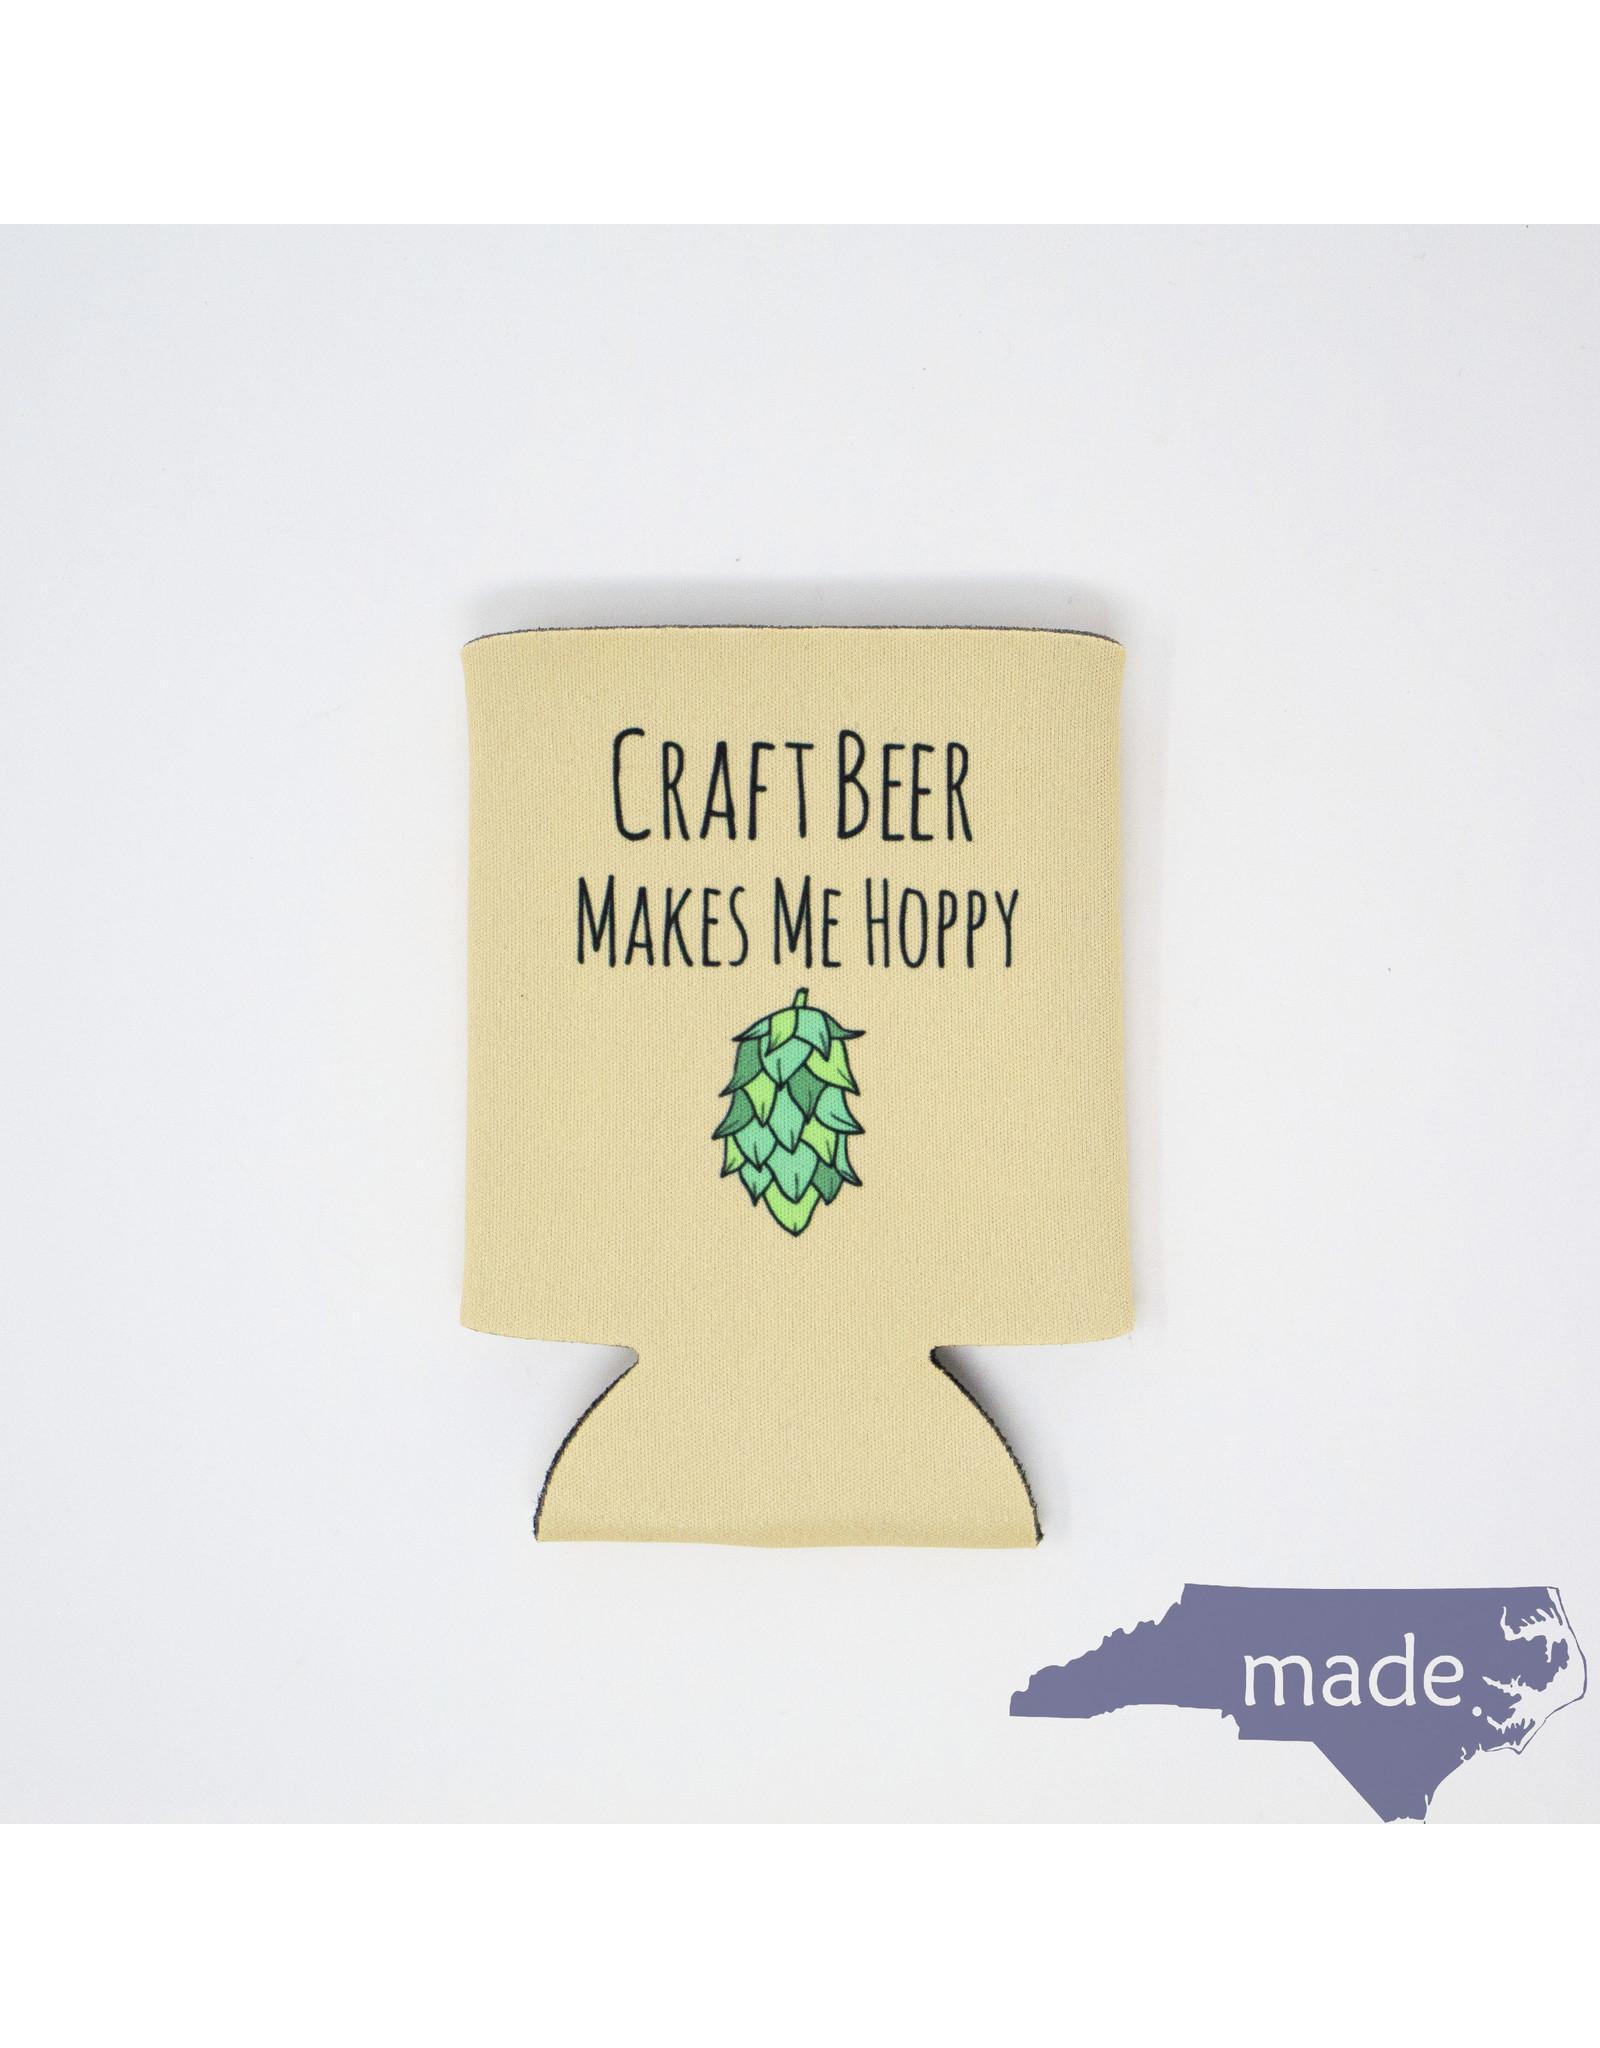 Moonlight Makers Craft Beer Hoppy Can Coolers - Moonlight Makers